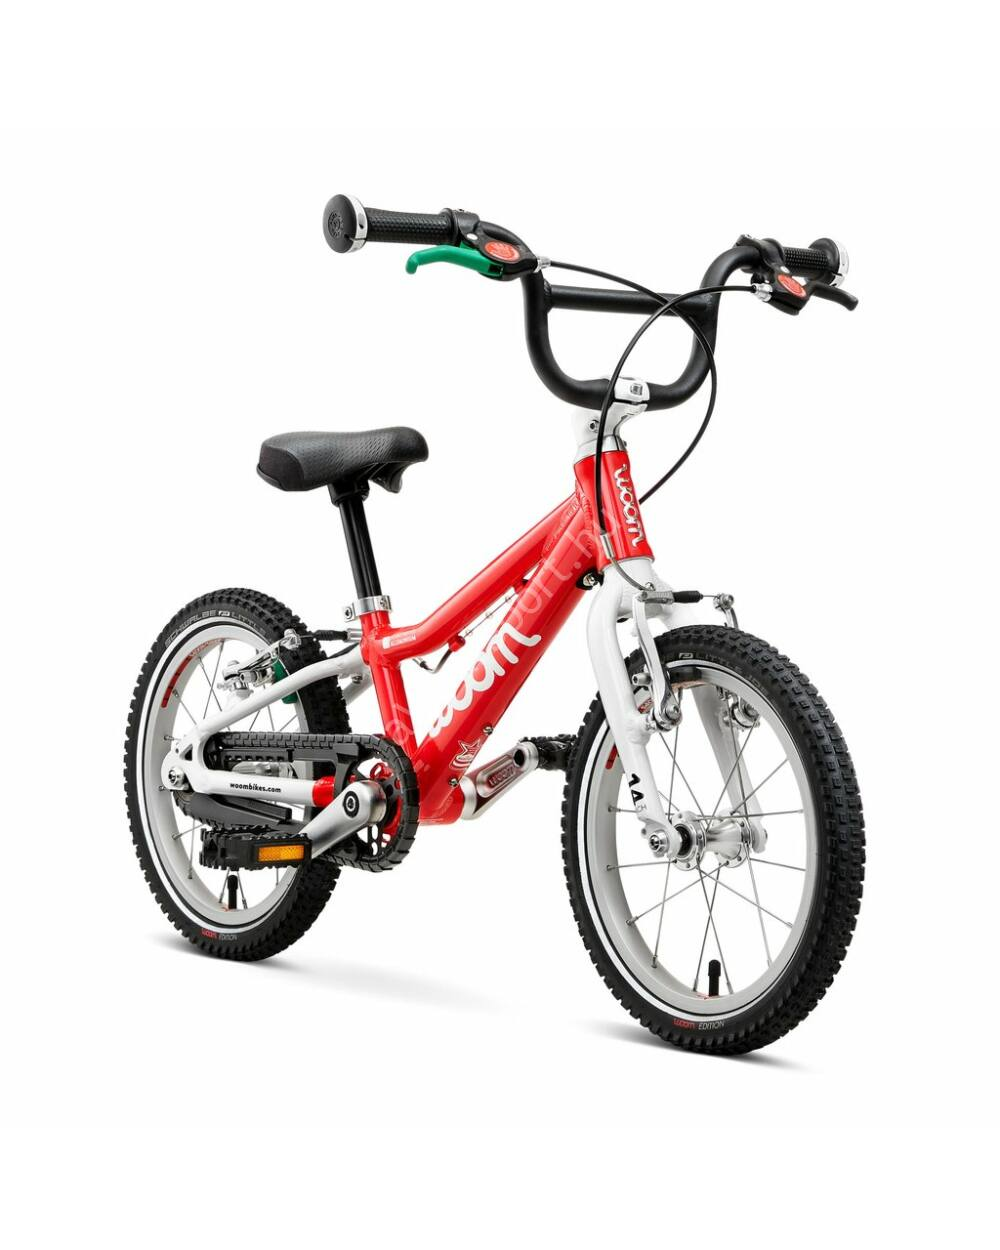 "Woom 2 piros 14"" gyerek kerékpár, 95-110 cm testmagasság, 5.1 kg"